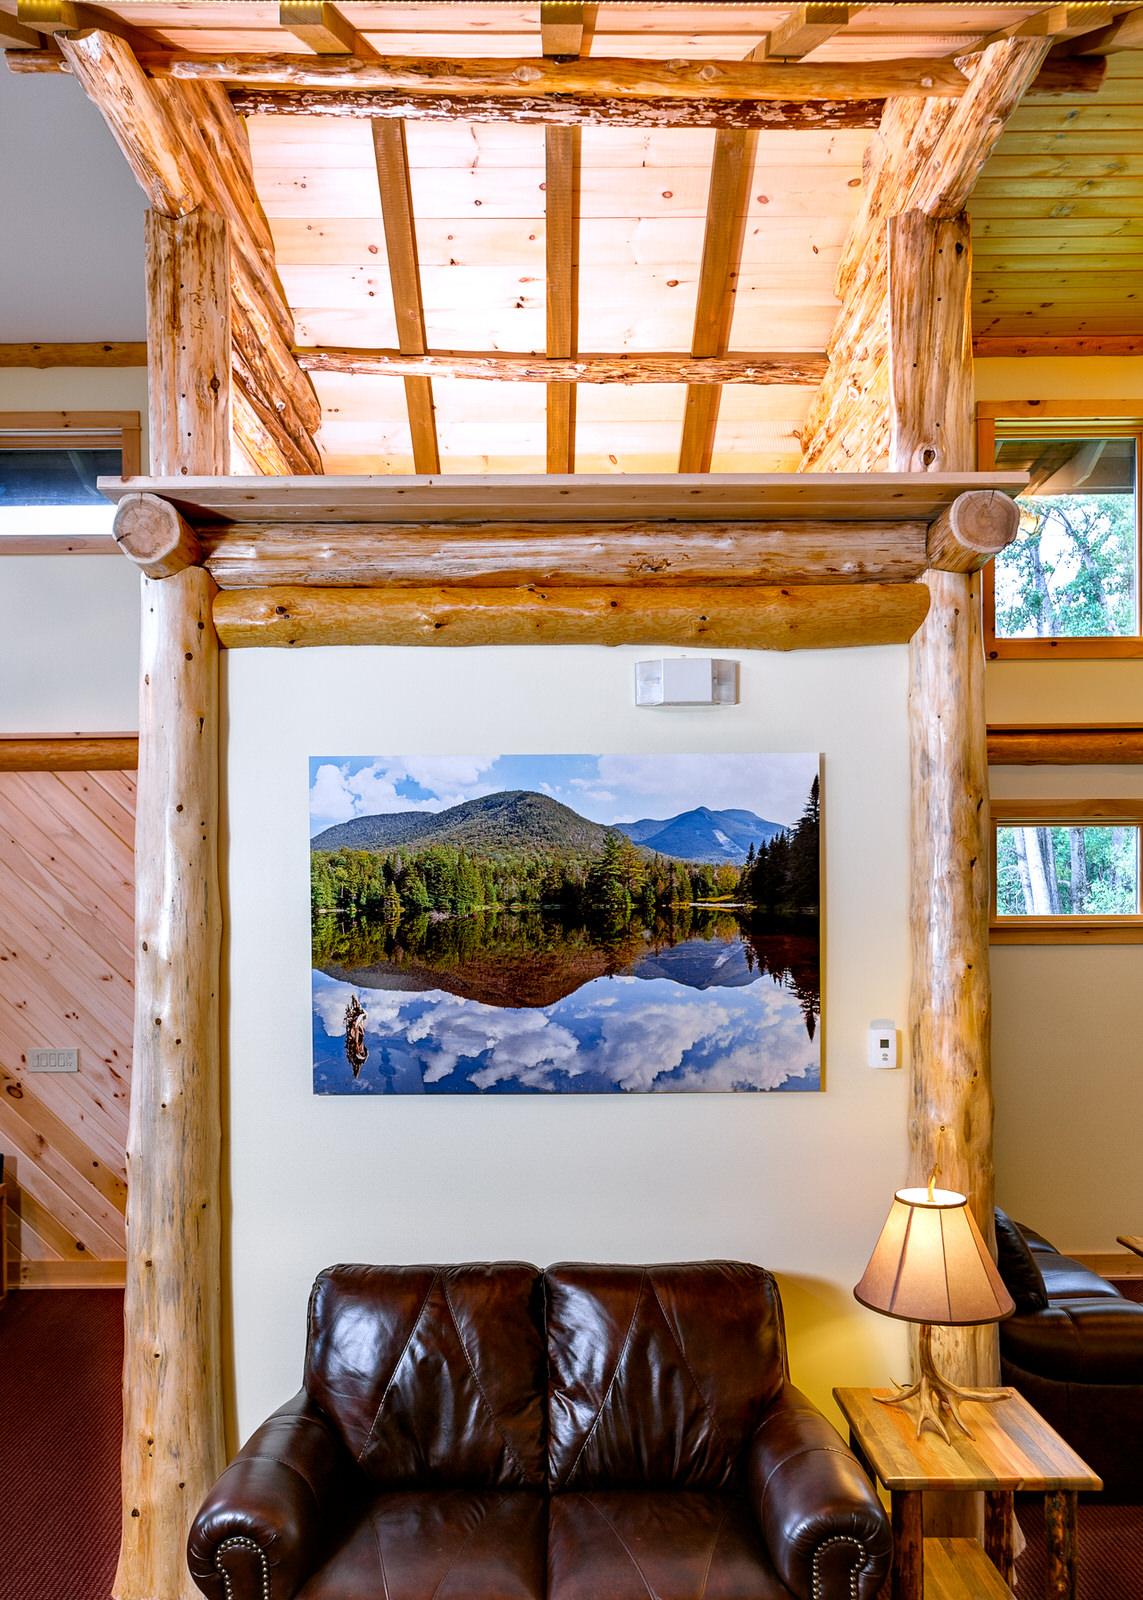 Adk-Spruce-Lodge-2048px-44.jpg